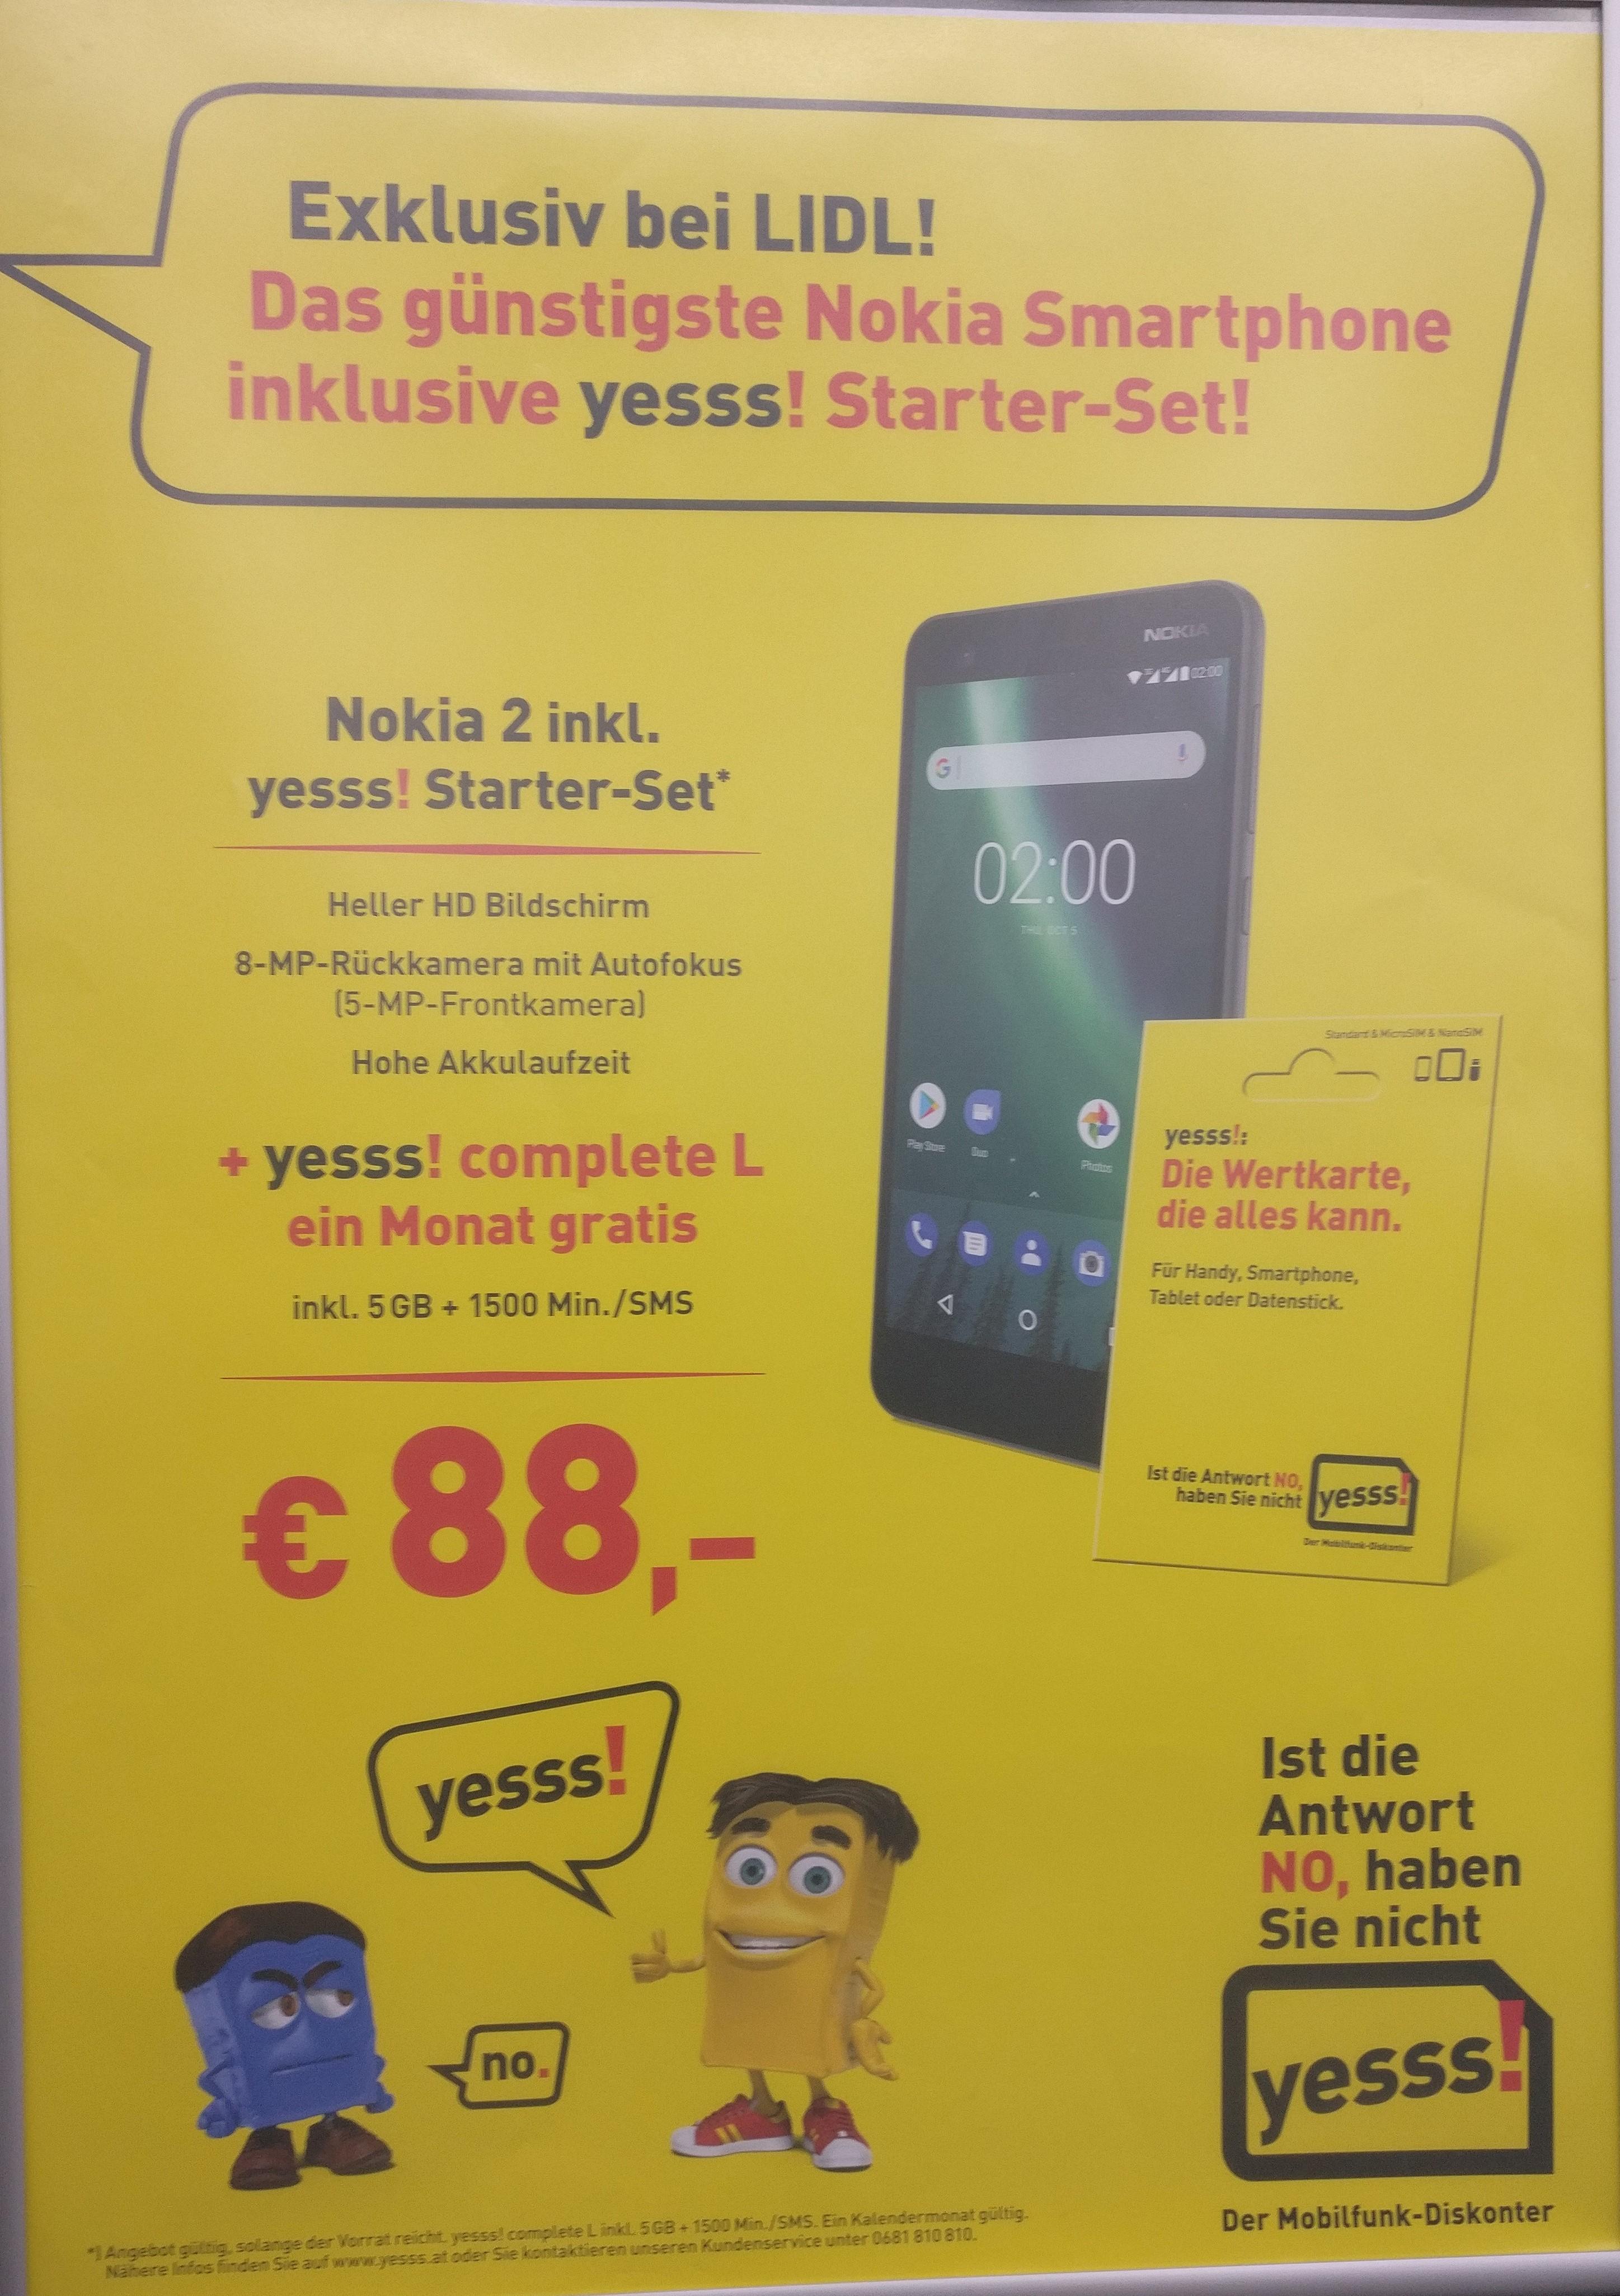 [LIDL] Nokia 2 + yesss! complete L ein Monat gratis